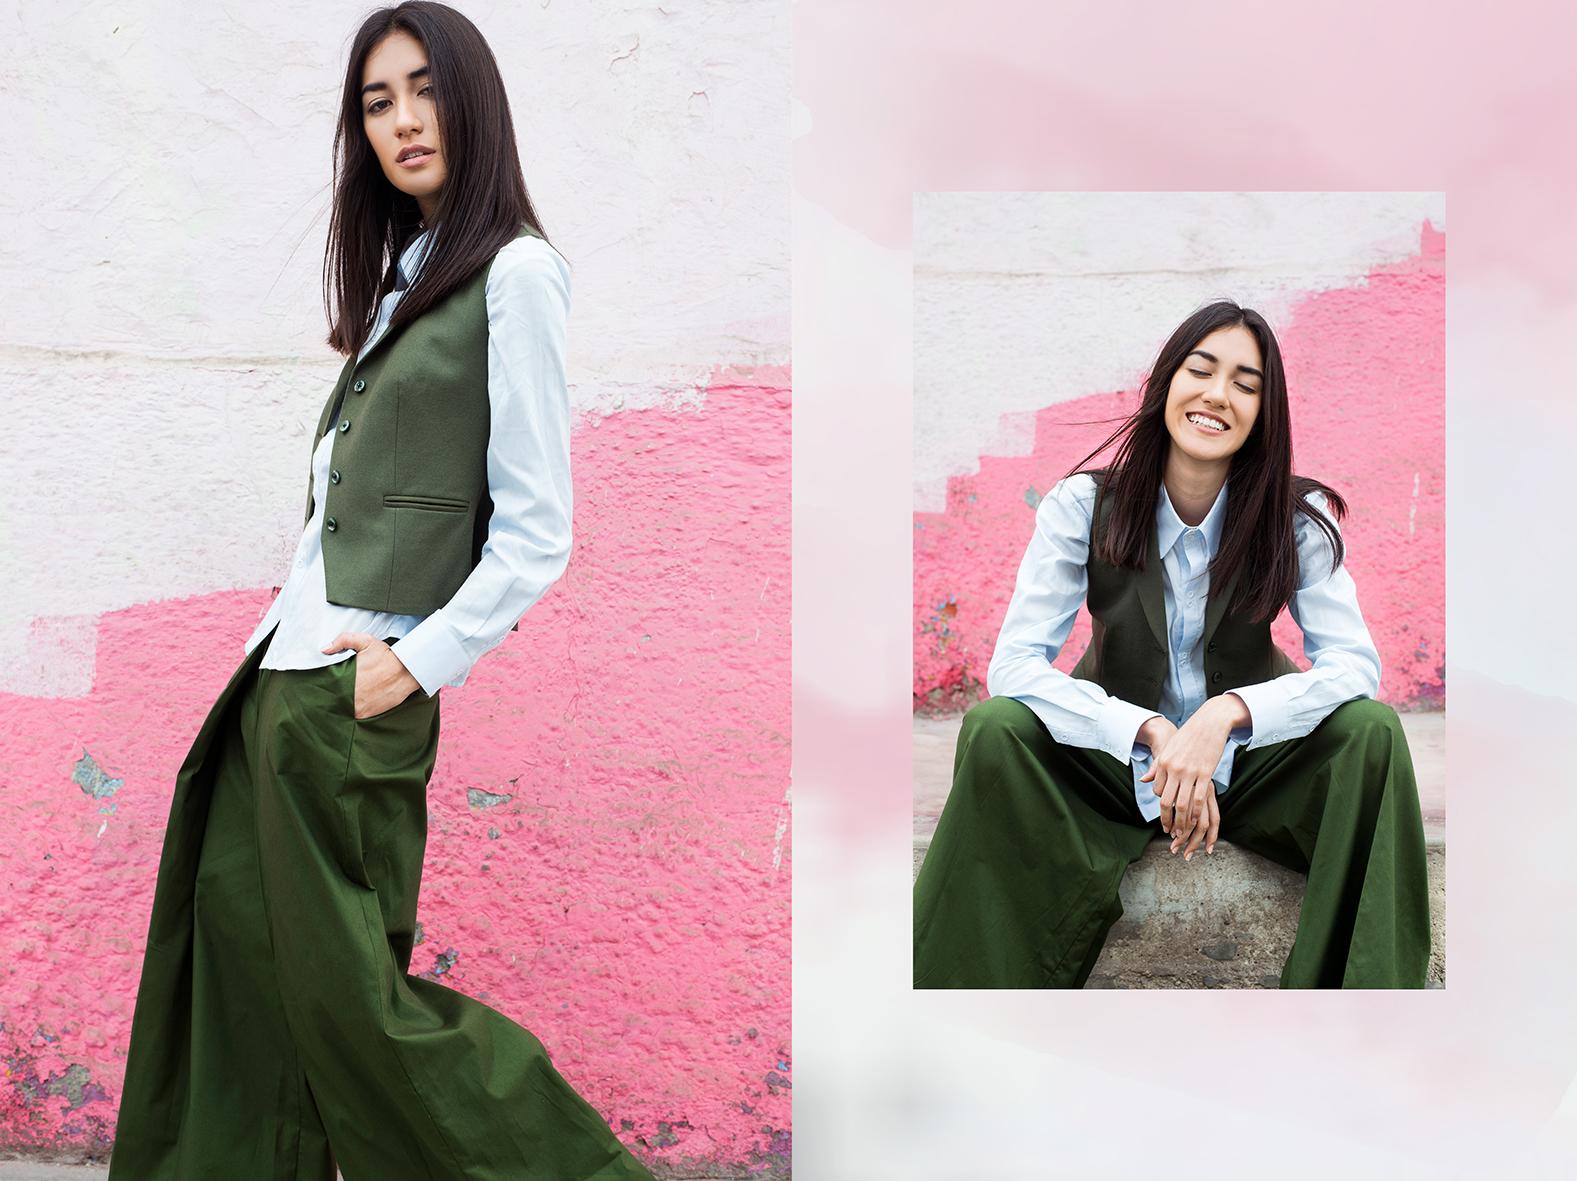 F Jord shirt,   GARUA.  Chaleco de lanilla,   YIRKO SIVIRICH.  Pantalón Cabo Seaweed,   GARUA.